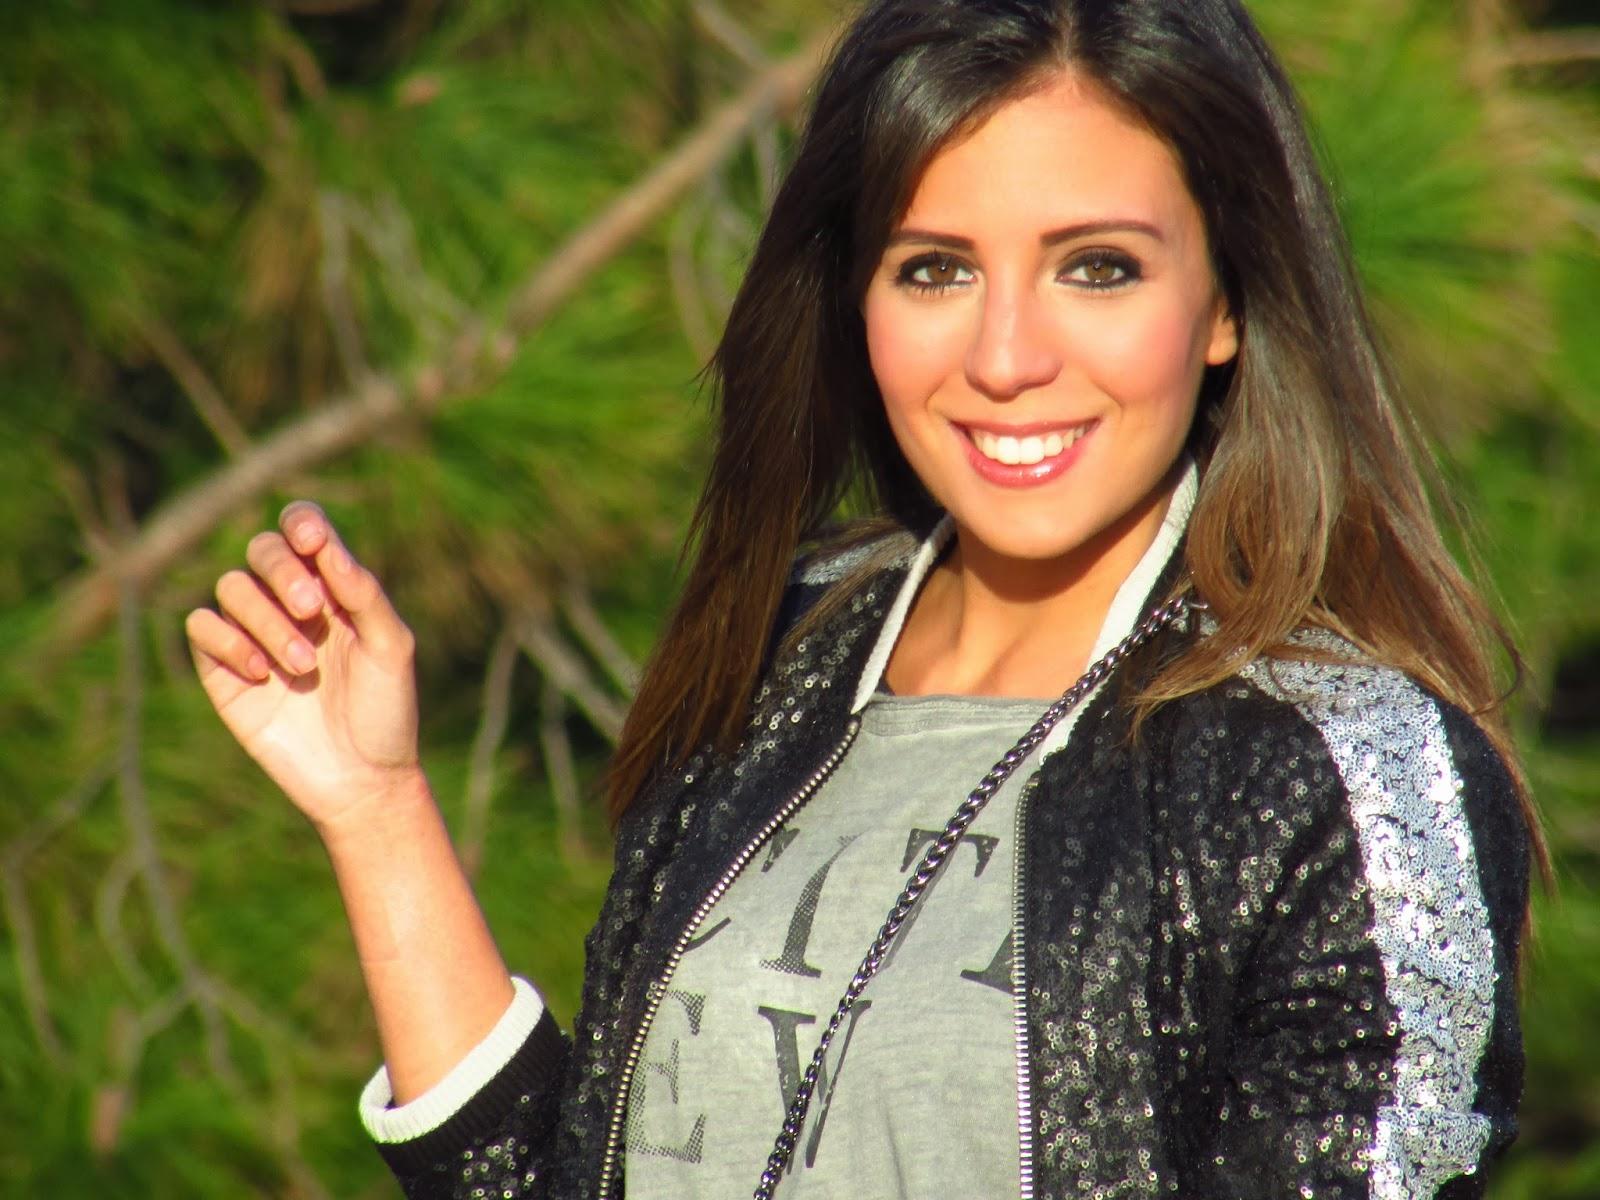 cristina style fashion blogger malagueña street style ootd tendencias moda inspitarion